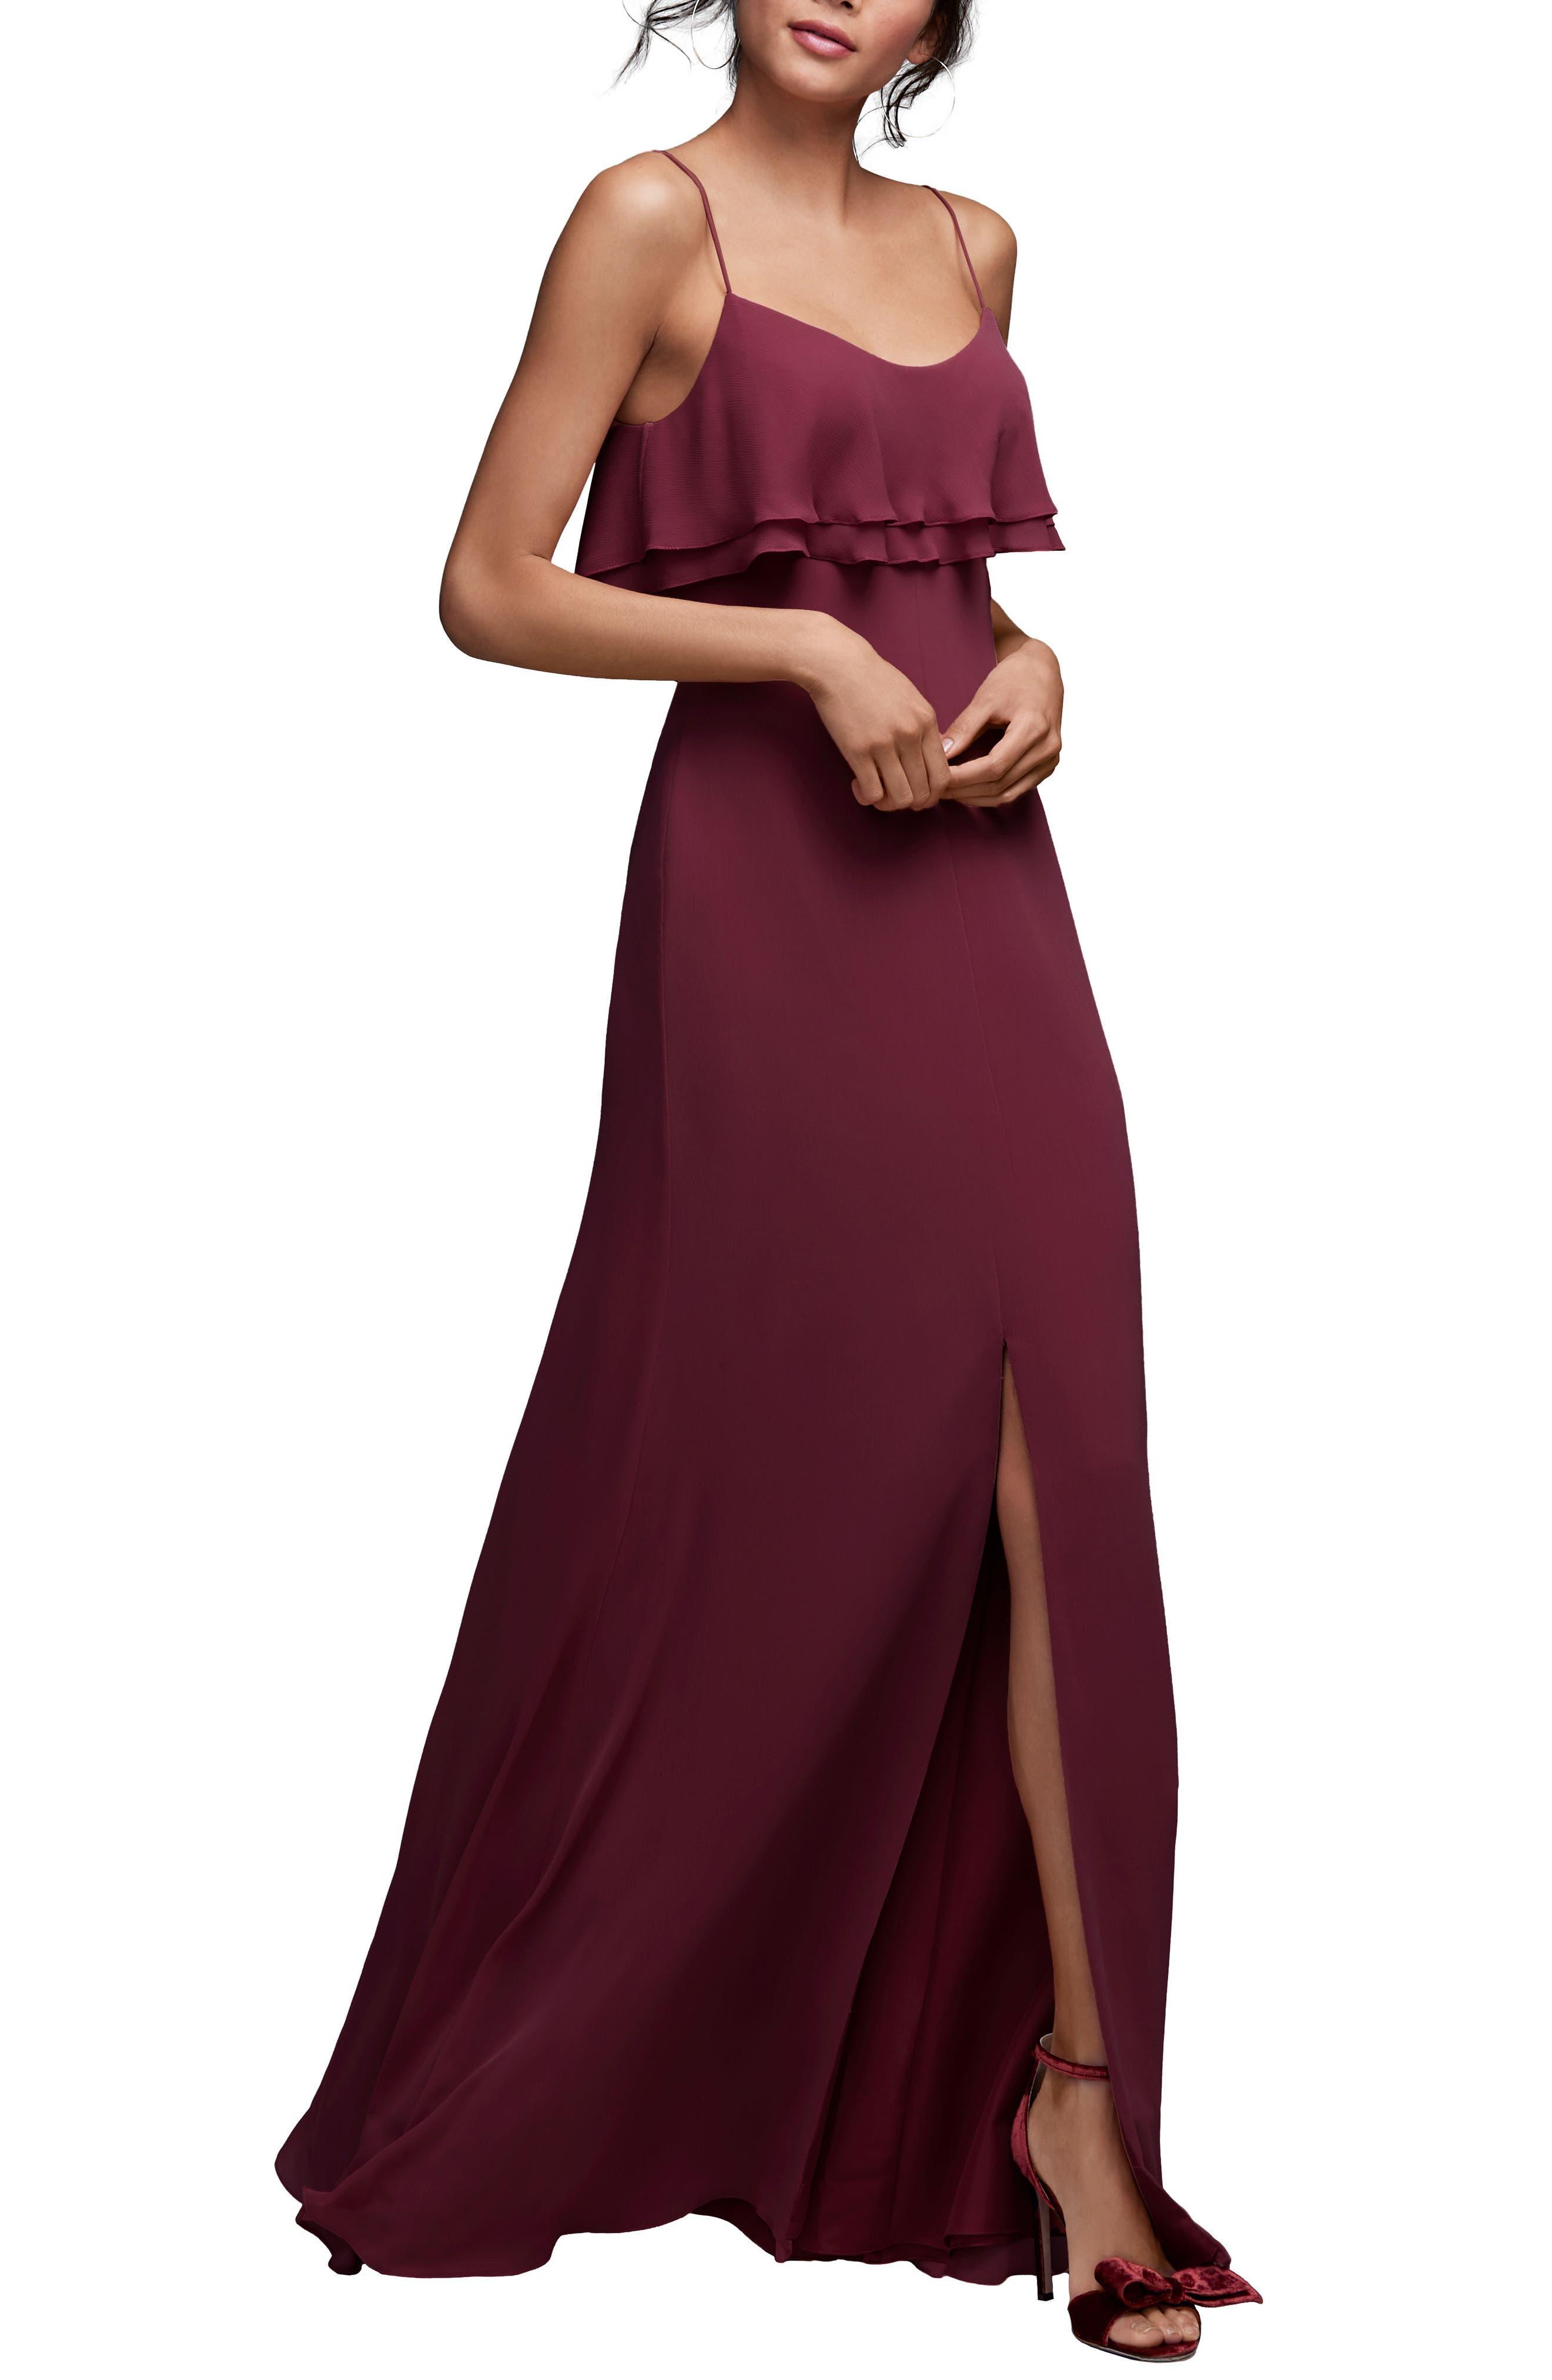 Jasper Ruffle Popover Gown,                             Main thumbnail 1, color,                             Wine